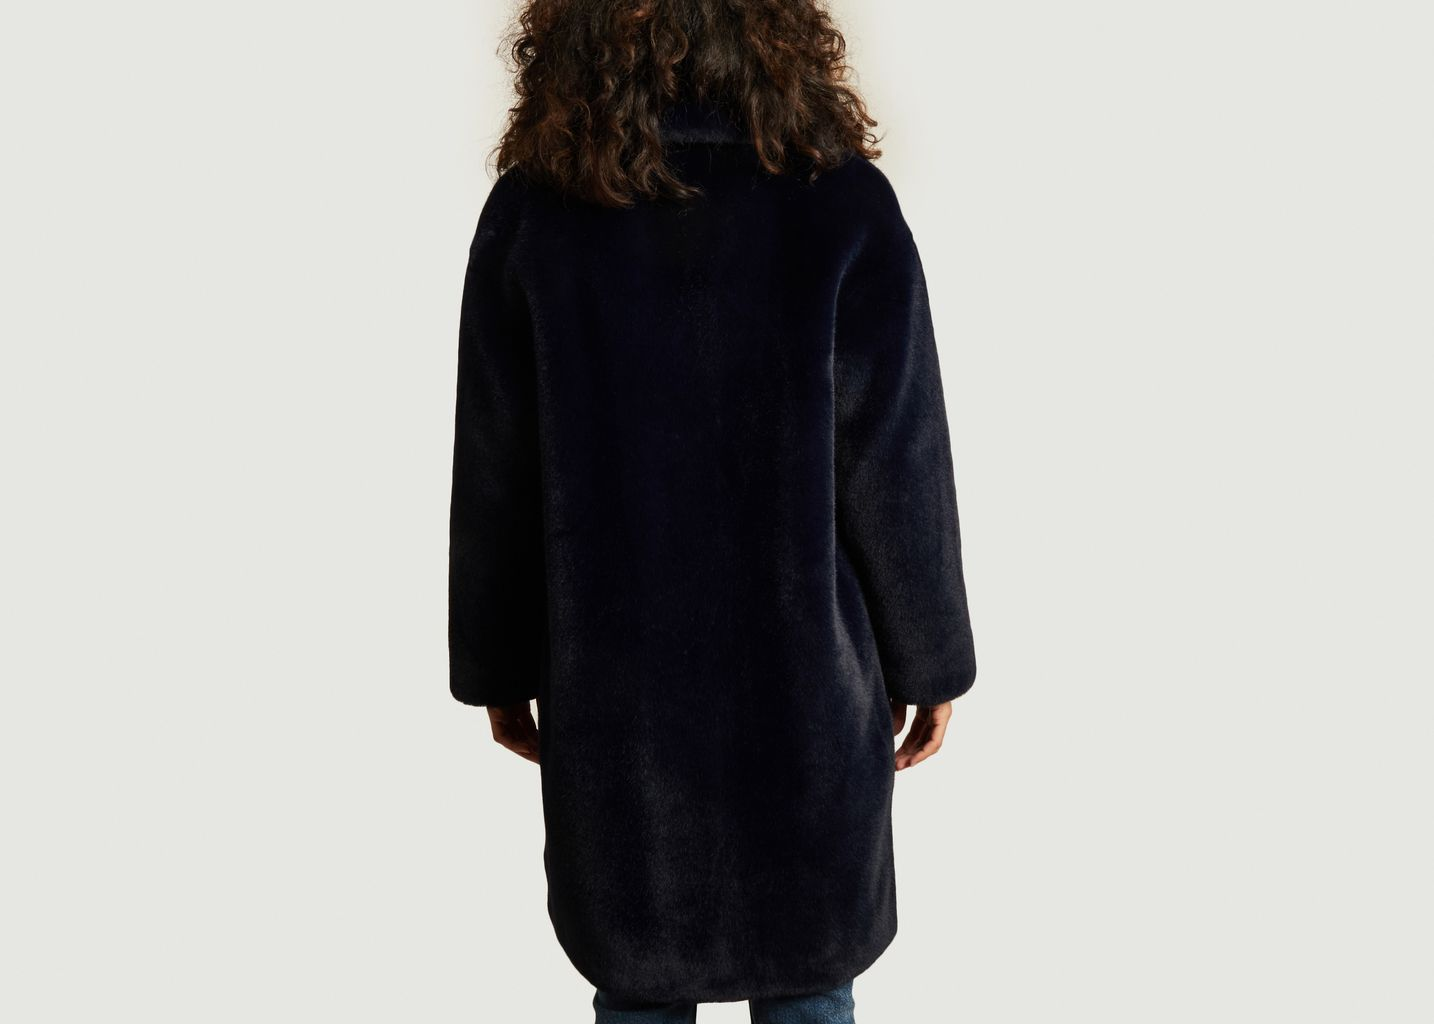 Manteau effet fourrure Camille Cocoon - Stand Studio